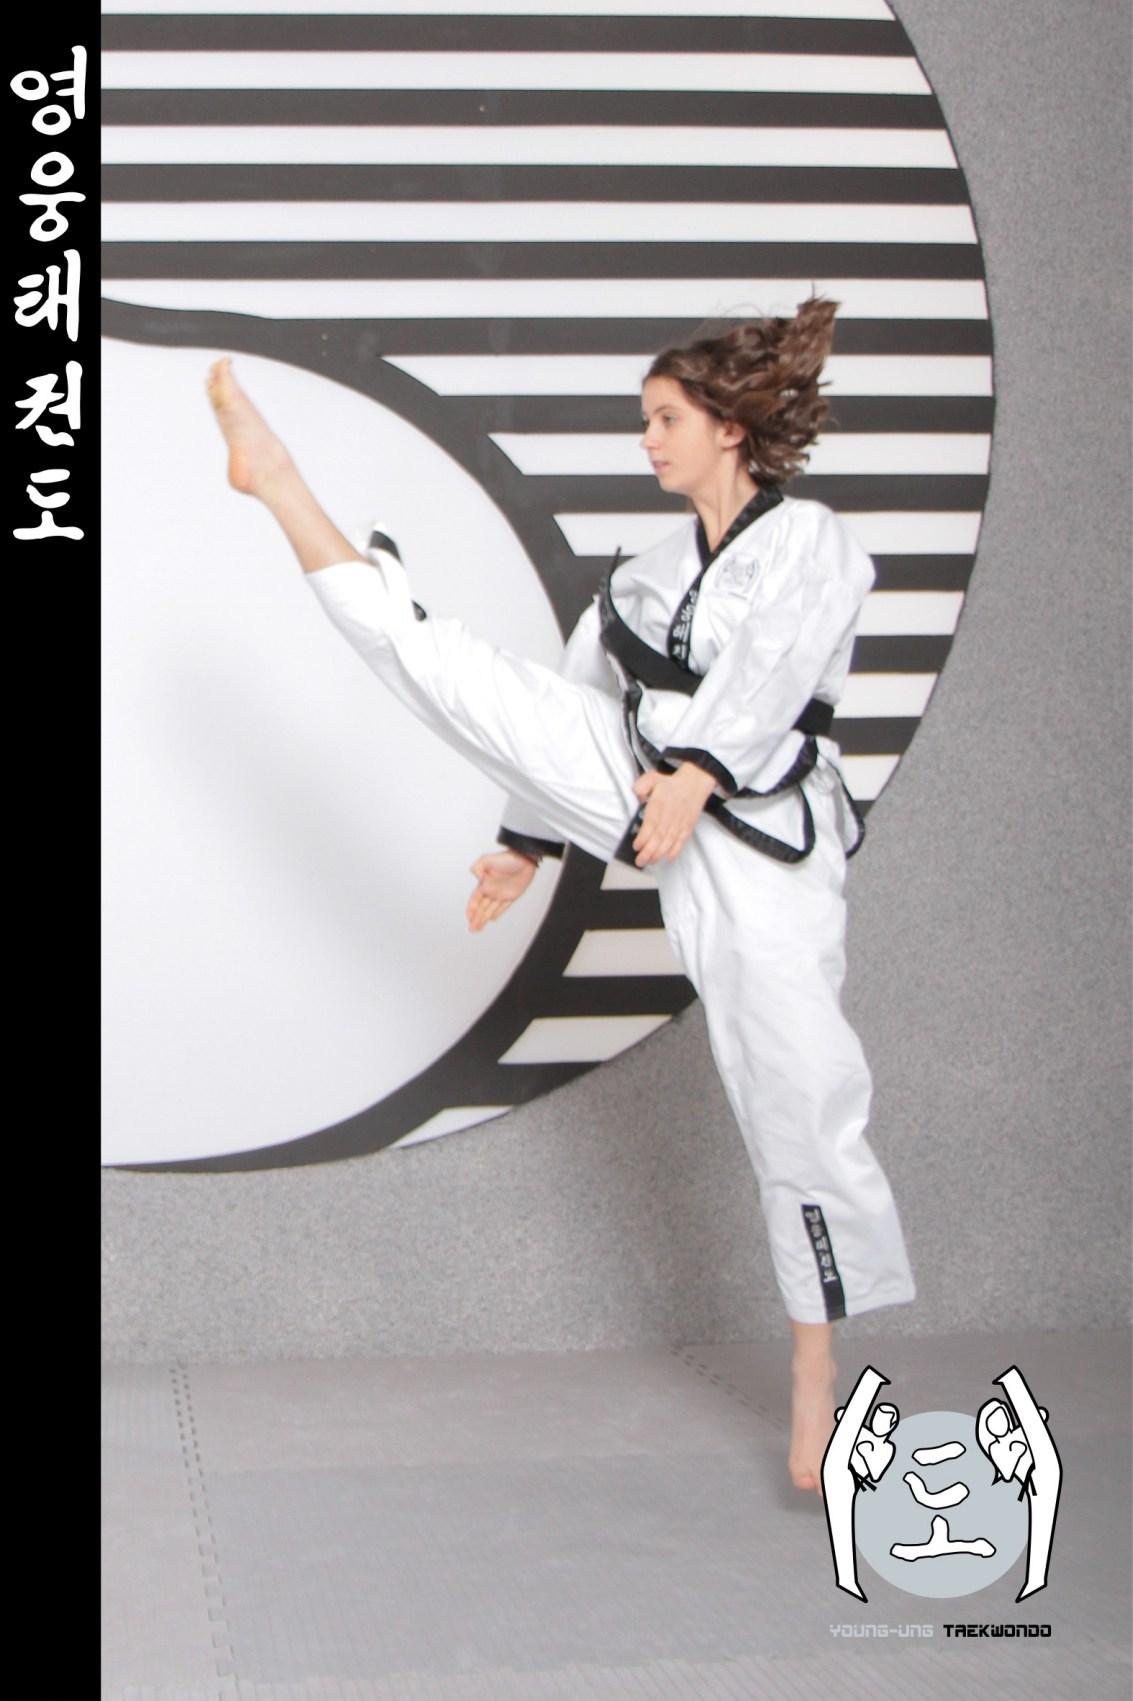 Junge Frau im Taekwondo Kampfanzug mit Schwarzgurt